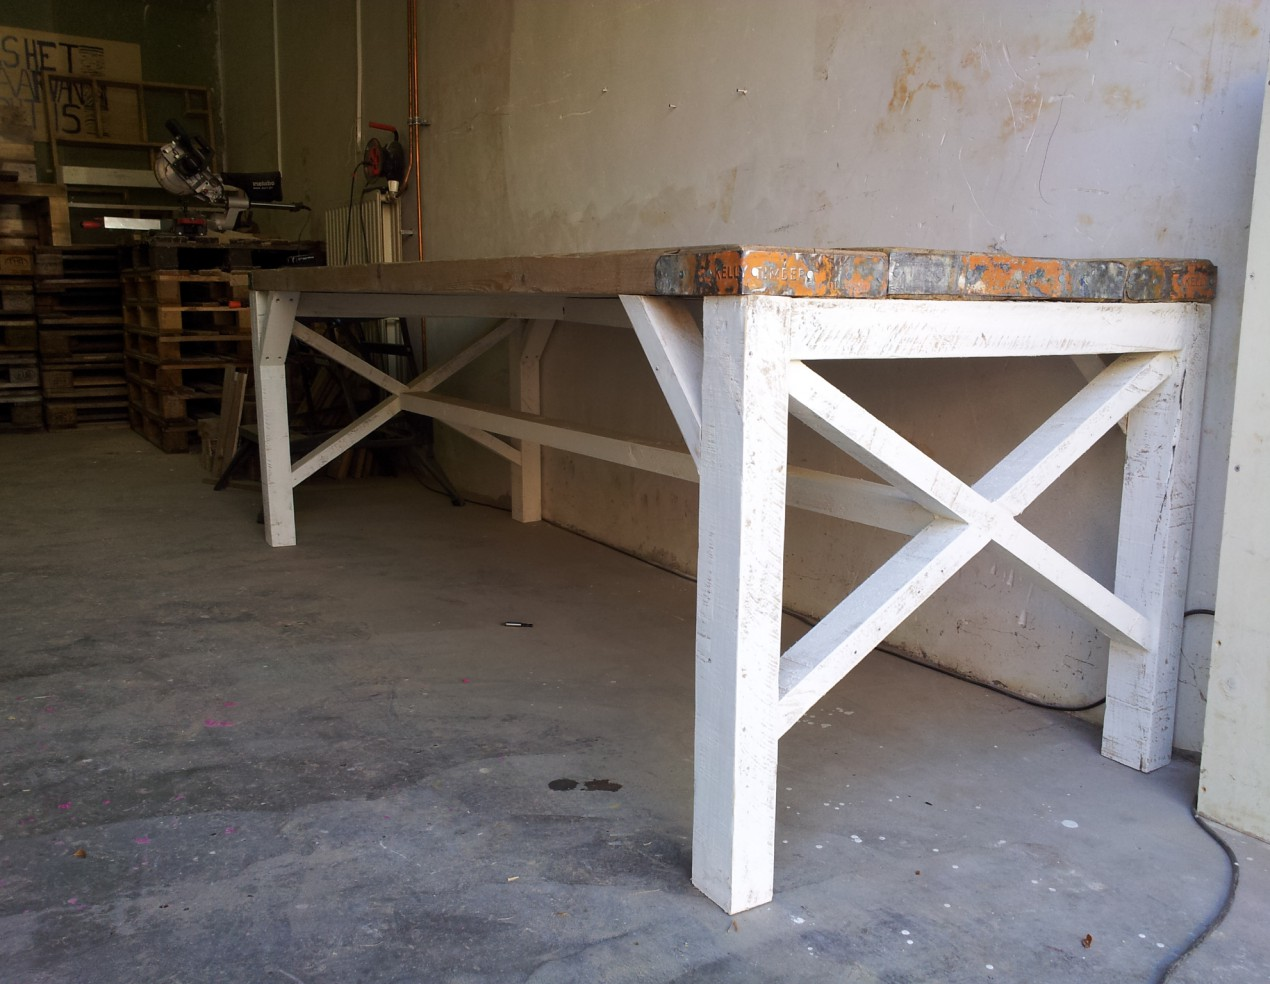 Grote Houten Tafels : Grote houten tafel steigerhouten tafel metalen onderstel x